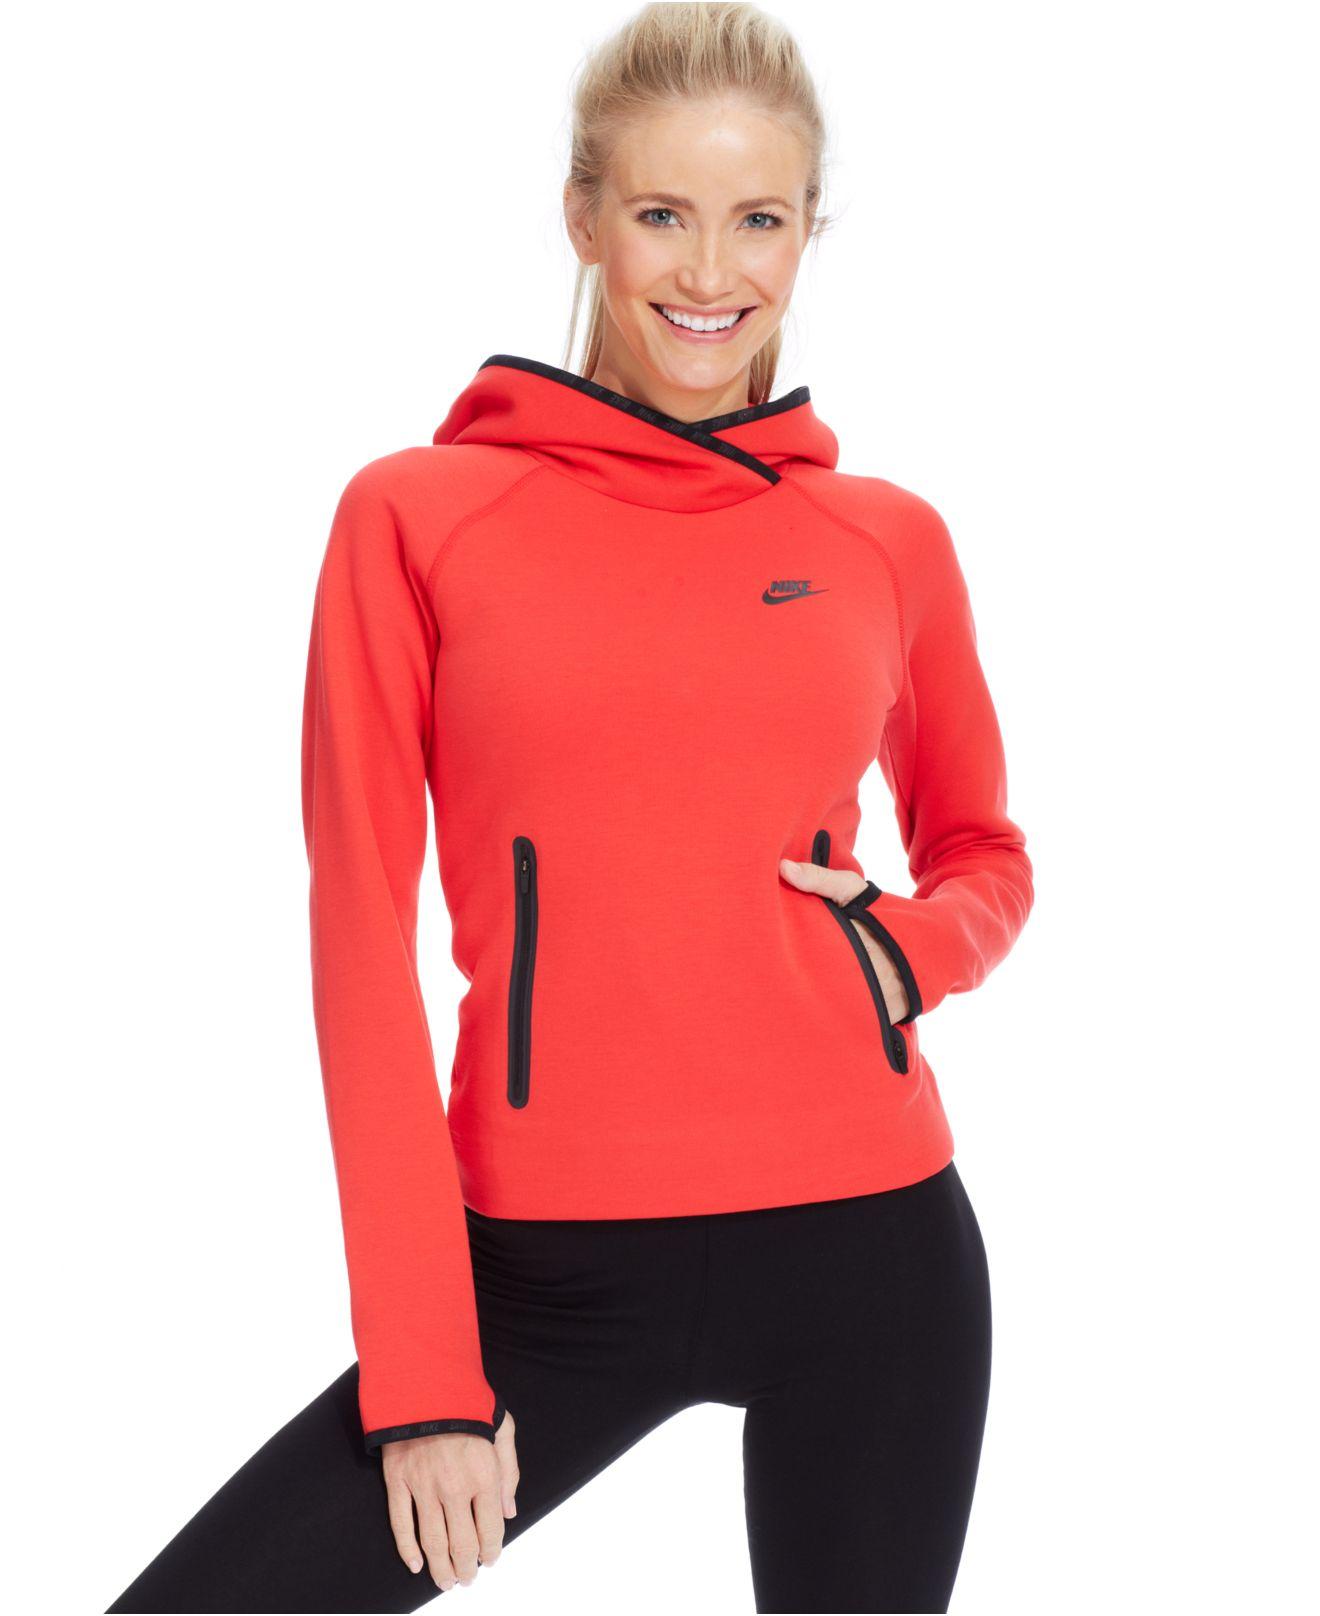 Lyst - Nike Tech Fleece Pullover Hoodie in Red 04309f9a6